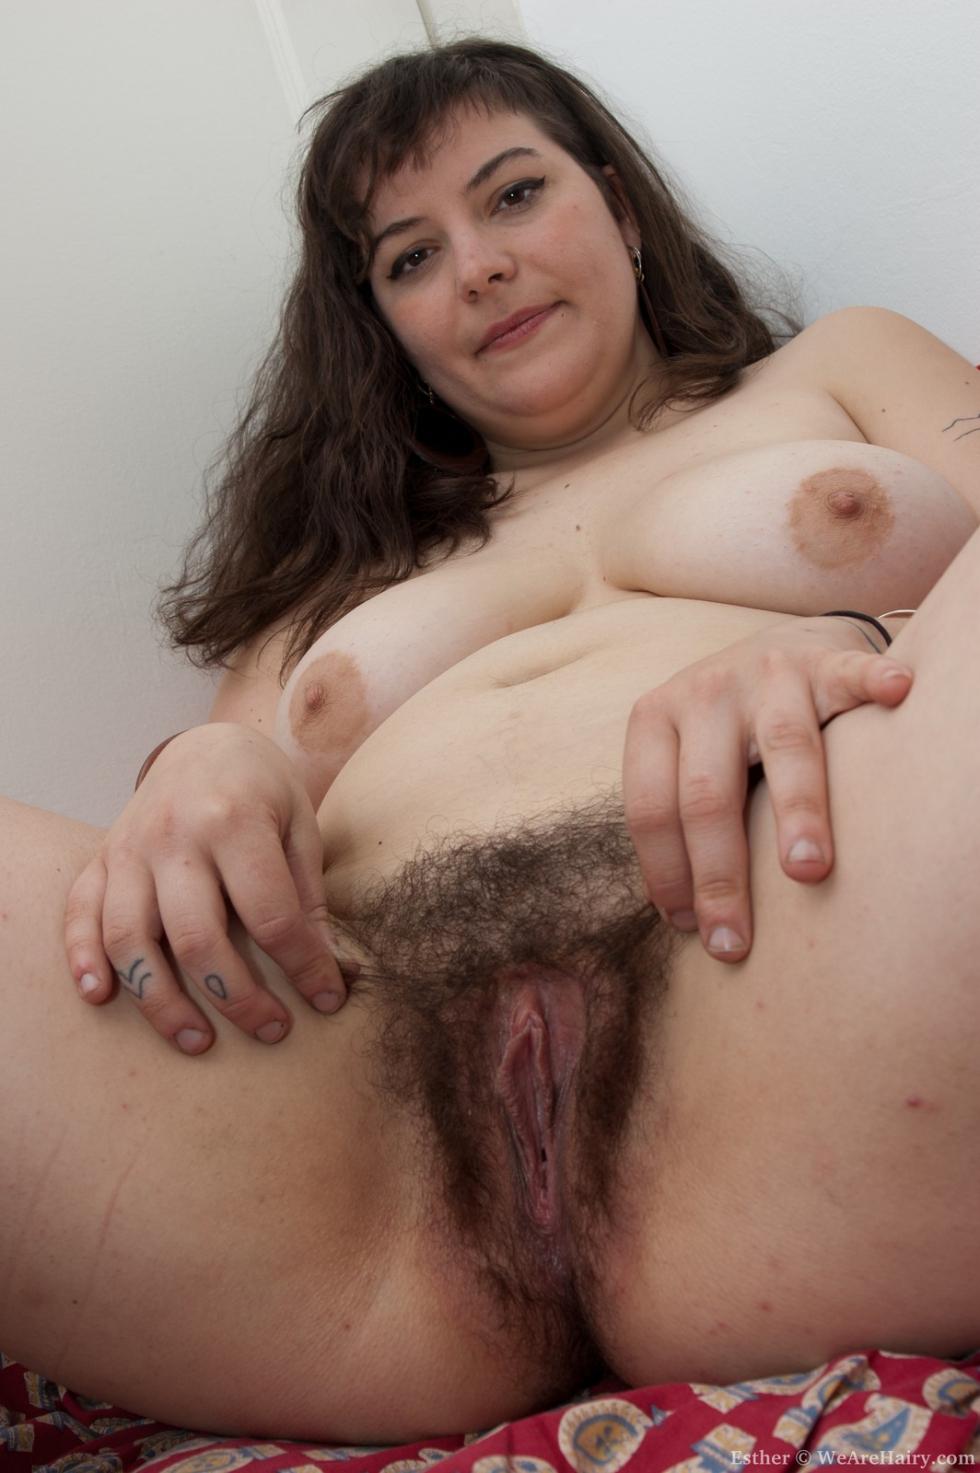 Female gloryhole tumblr